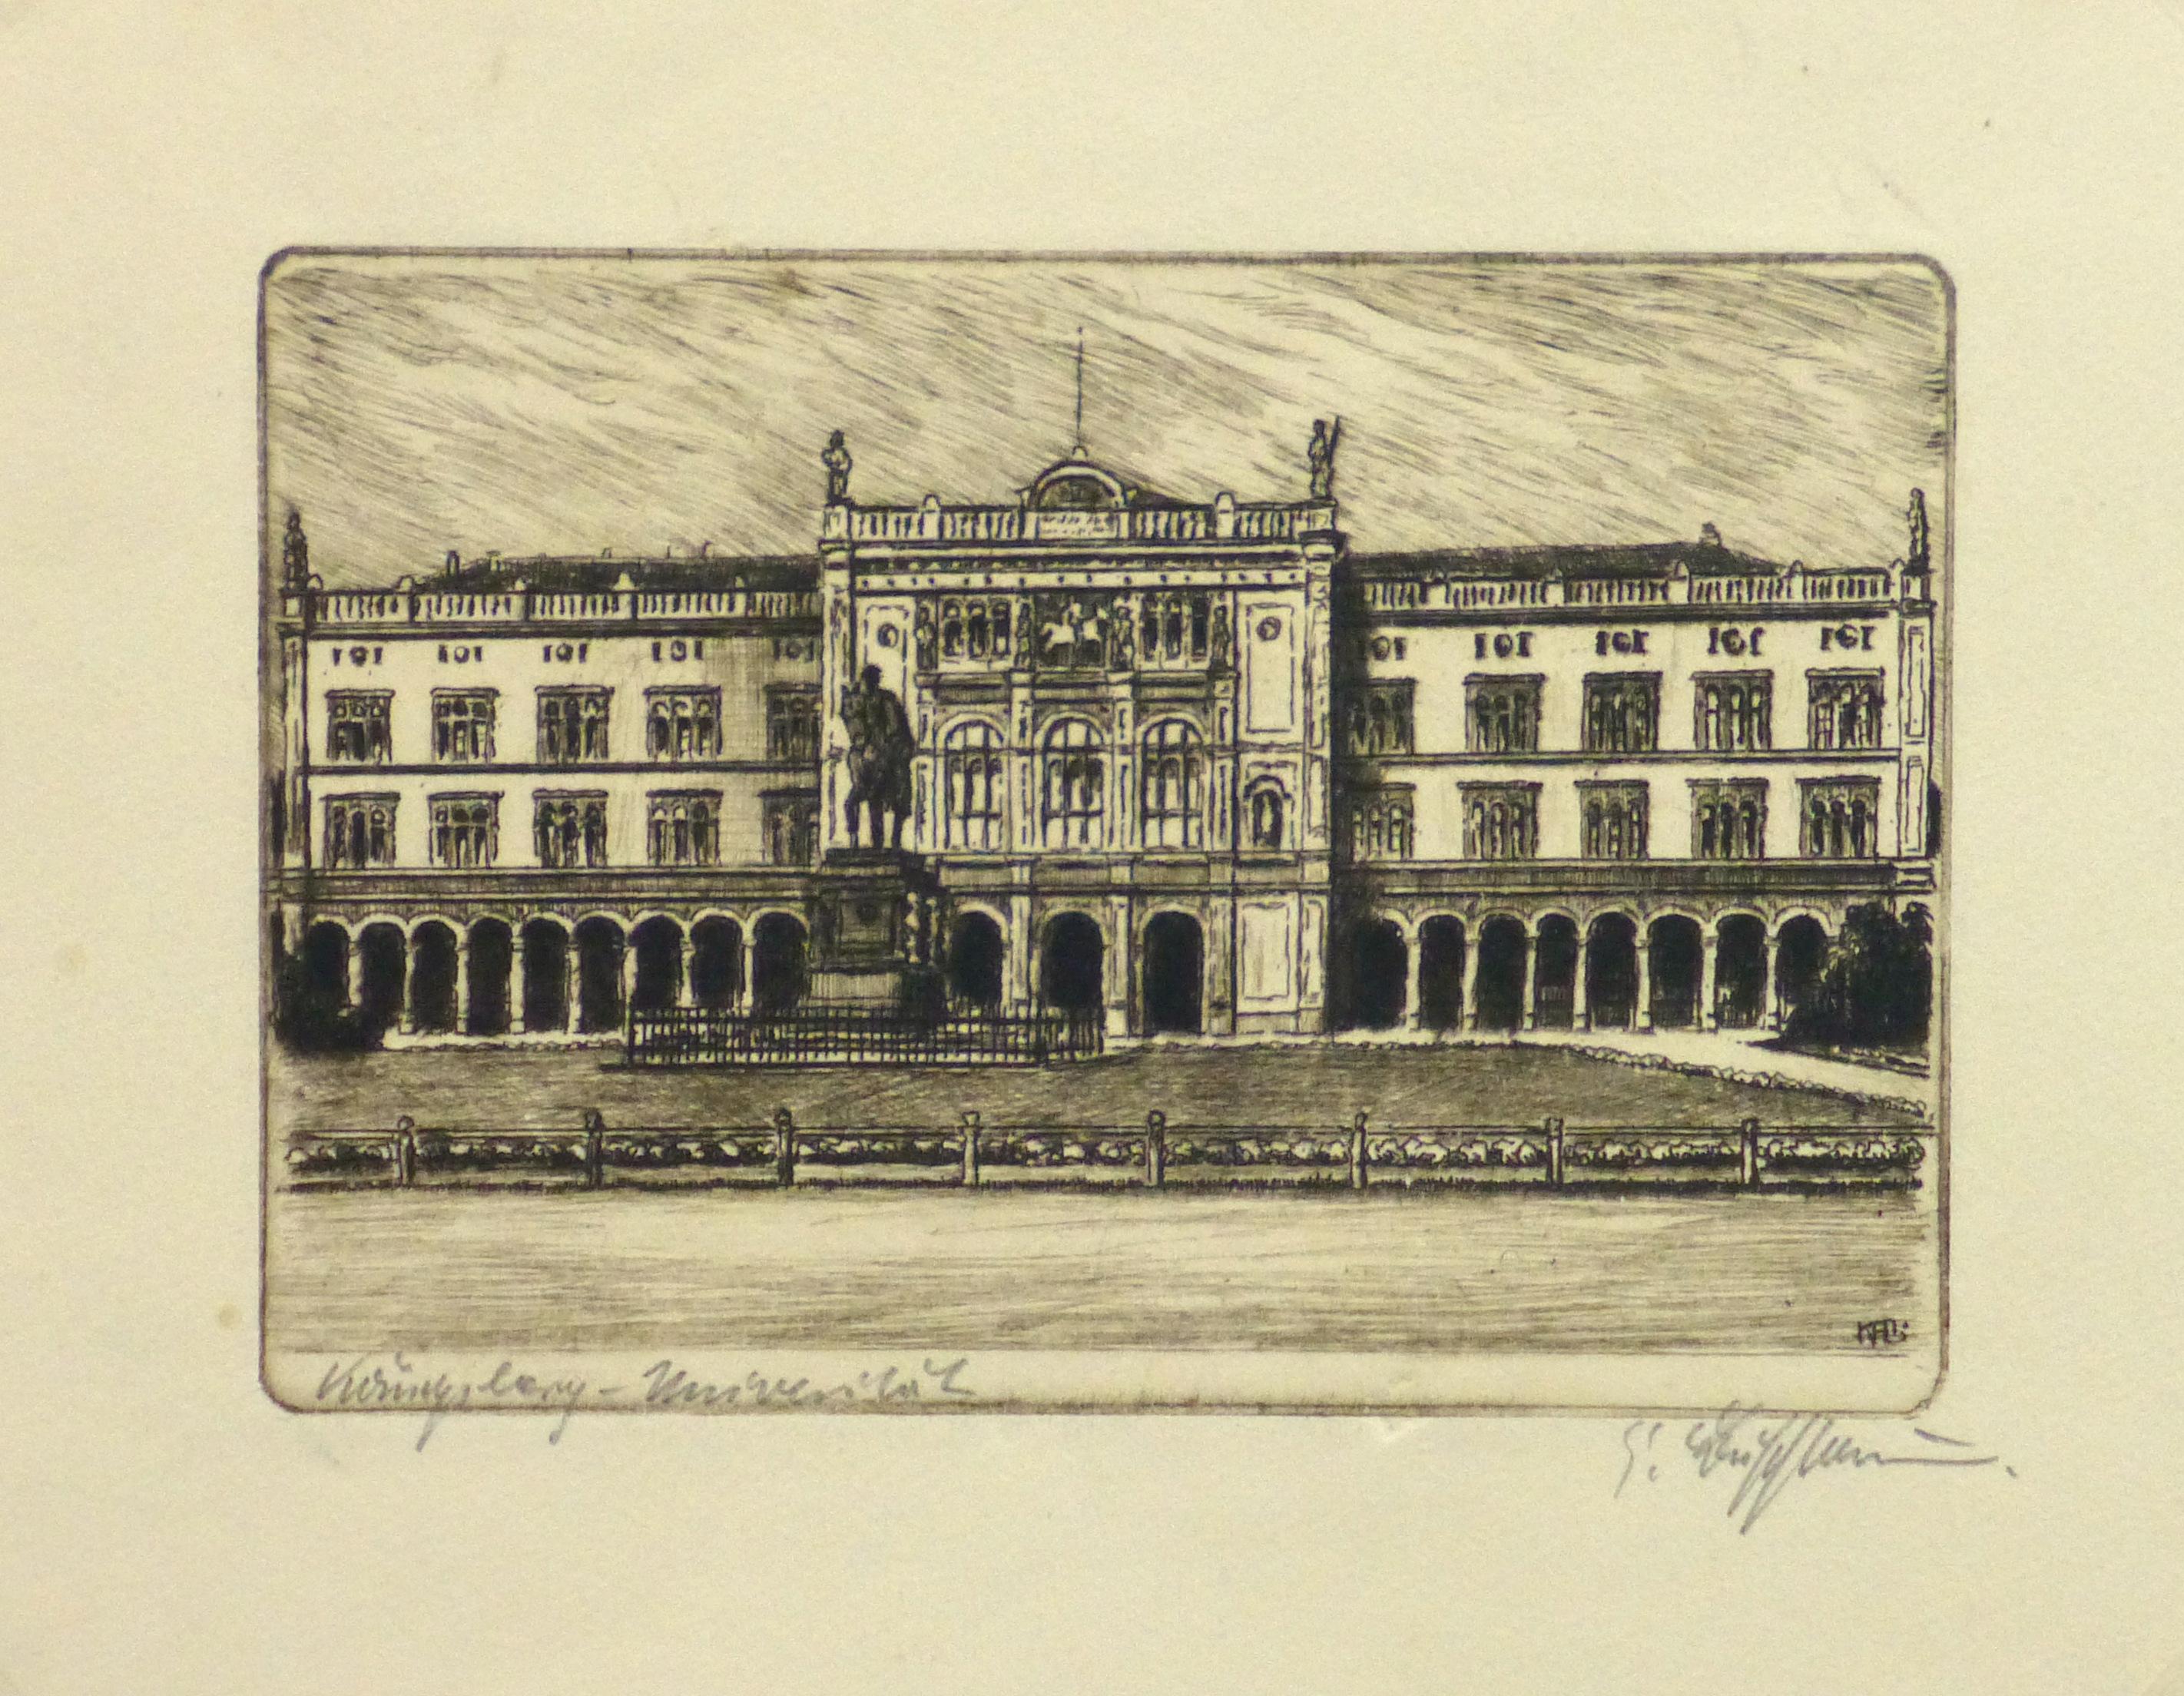 Etching - Stately Architecture, Circa 1950-main-10758M